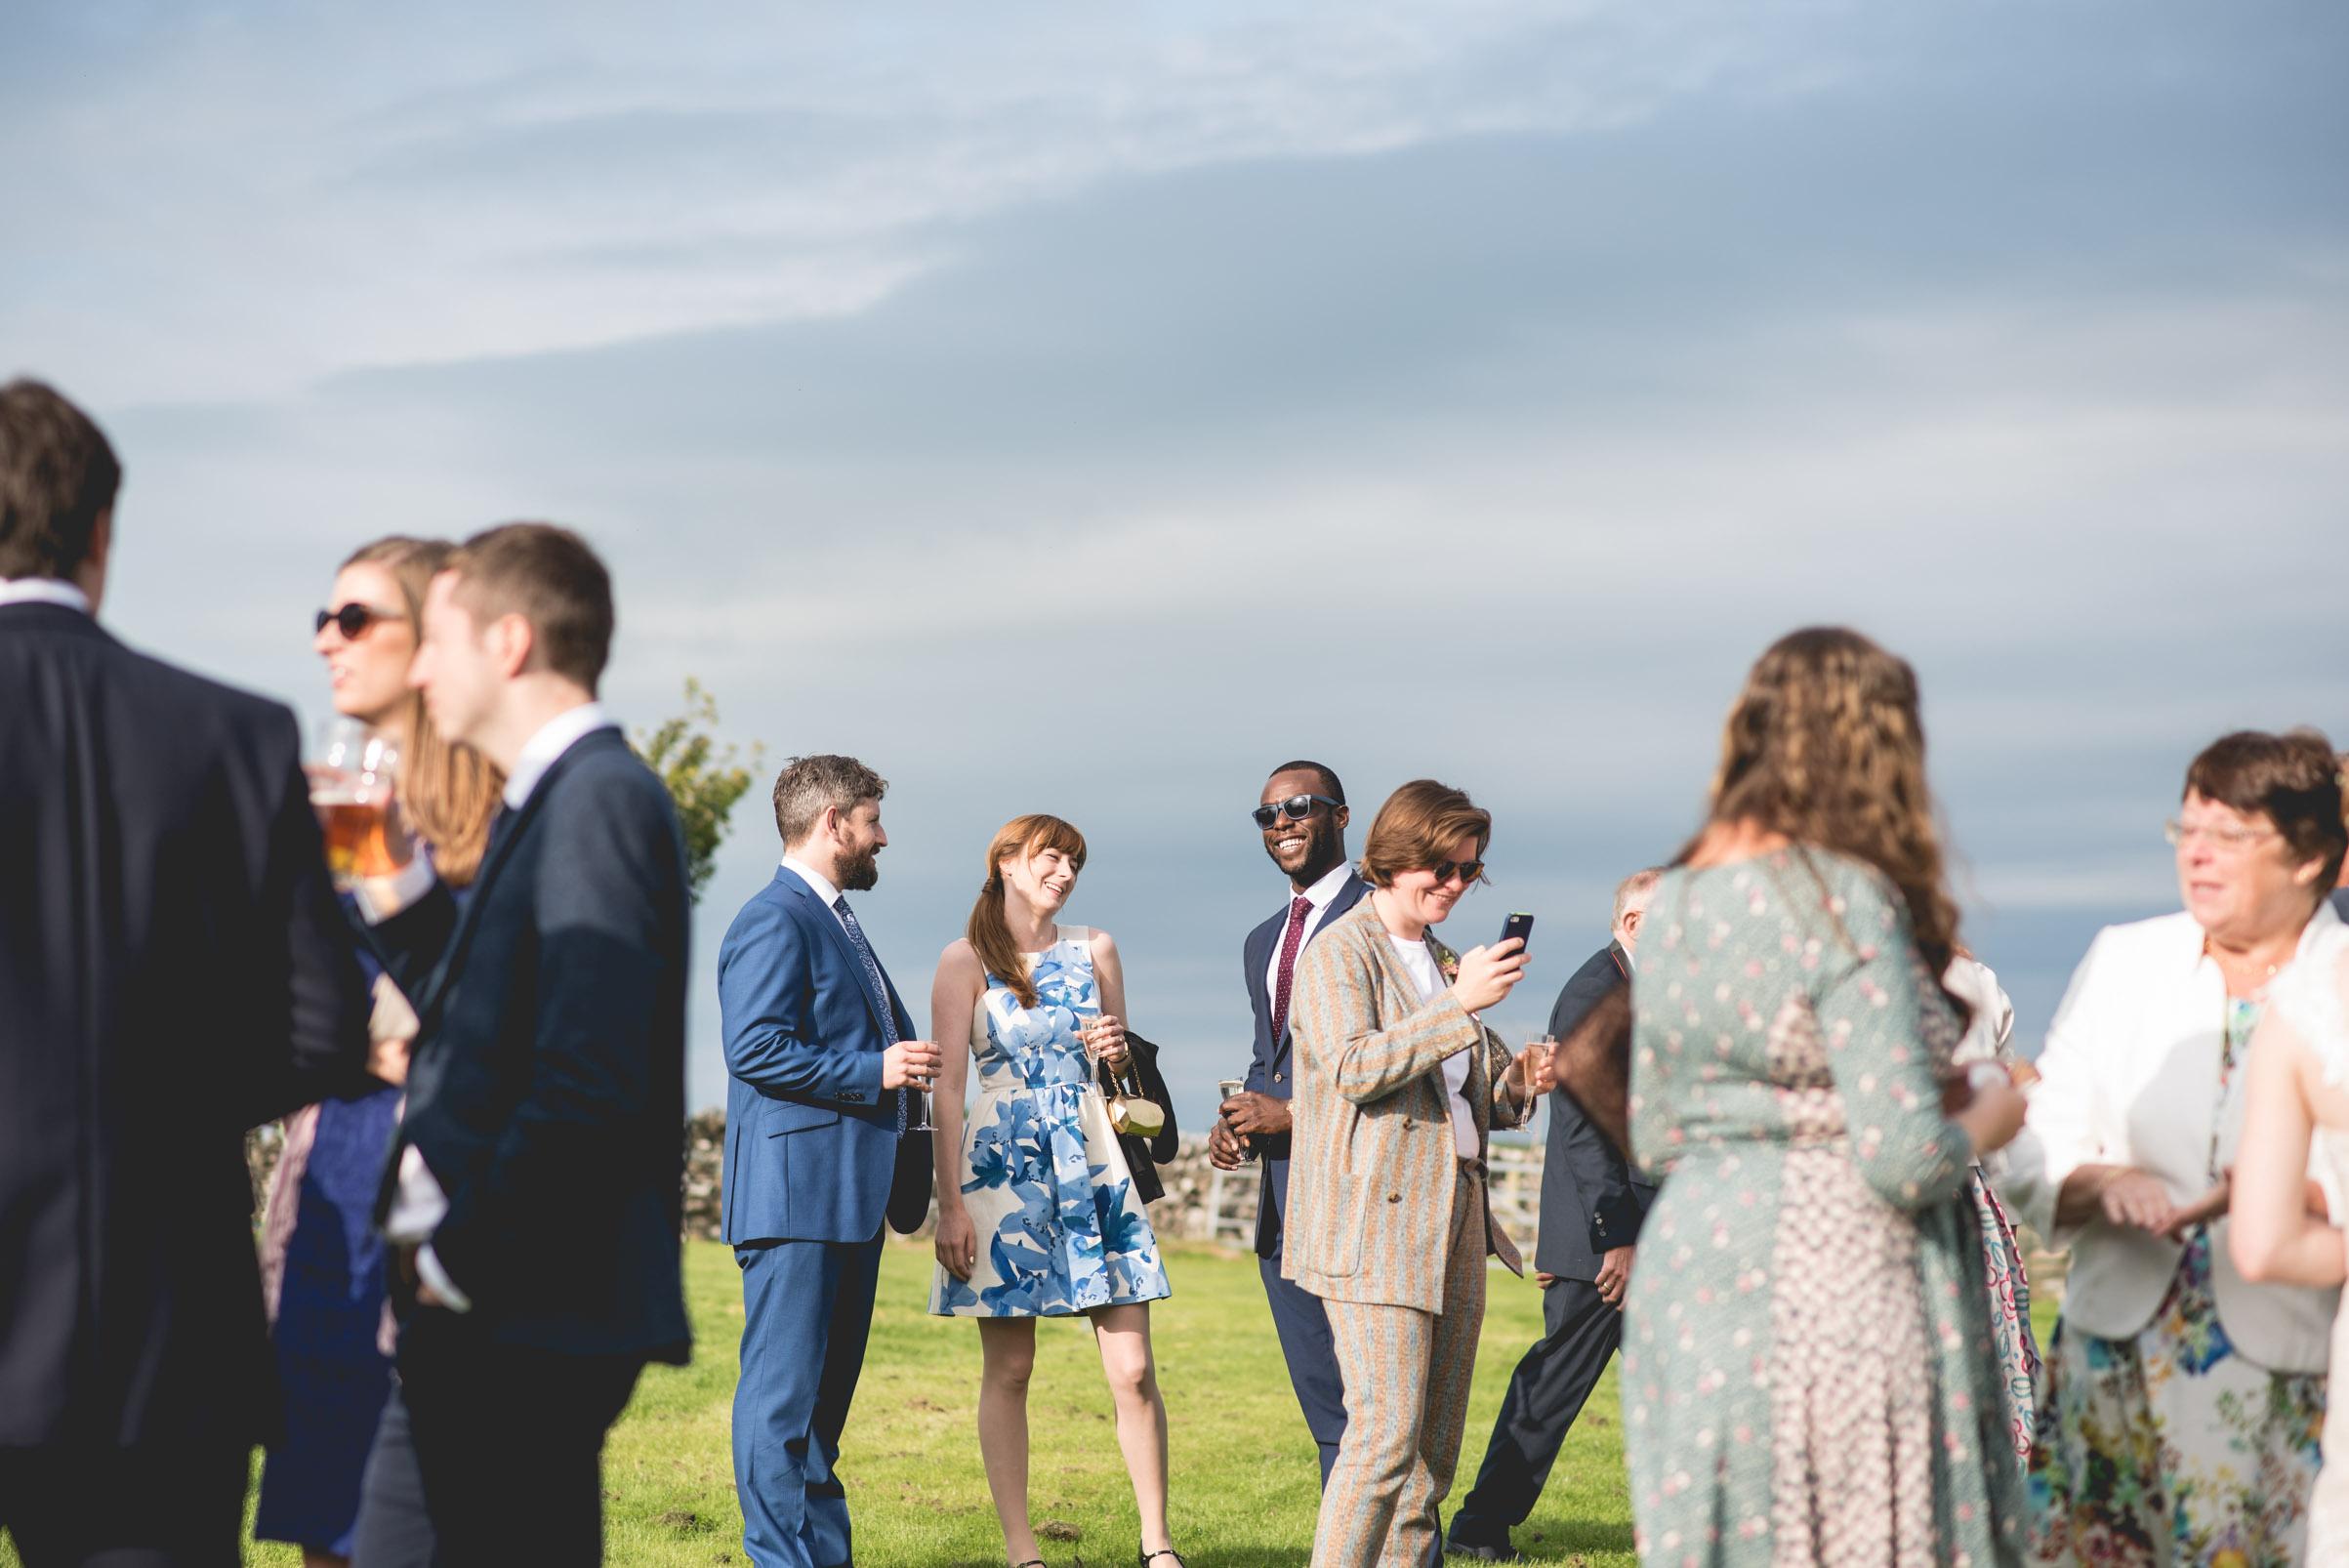 Peak+district+farm+wedding+lower+damgate+photographer-171.jpg